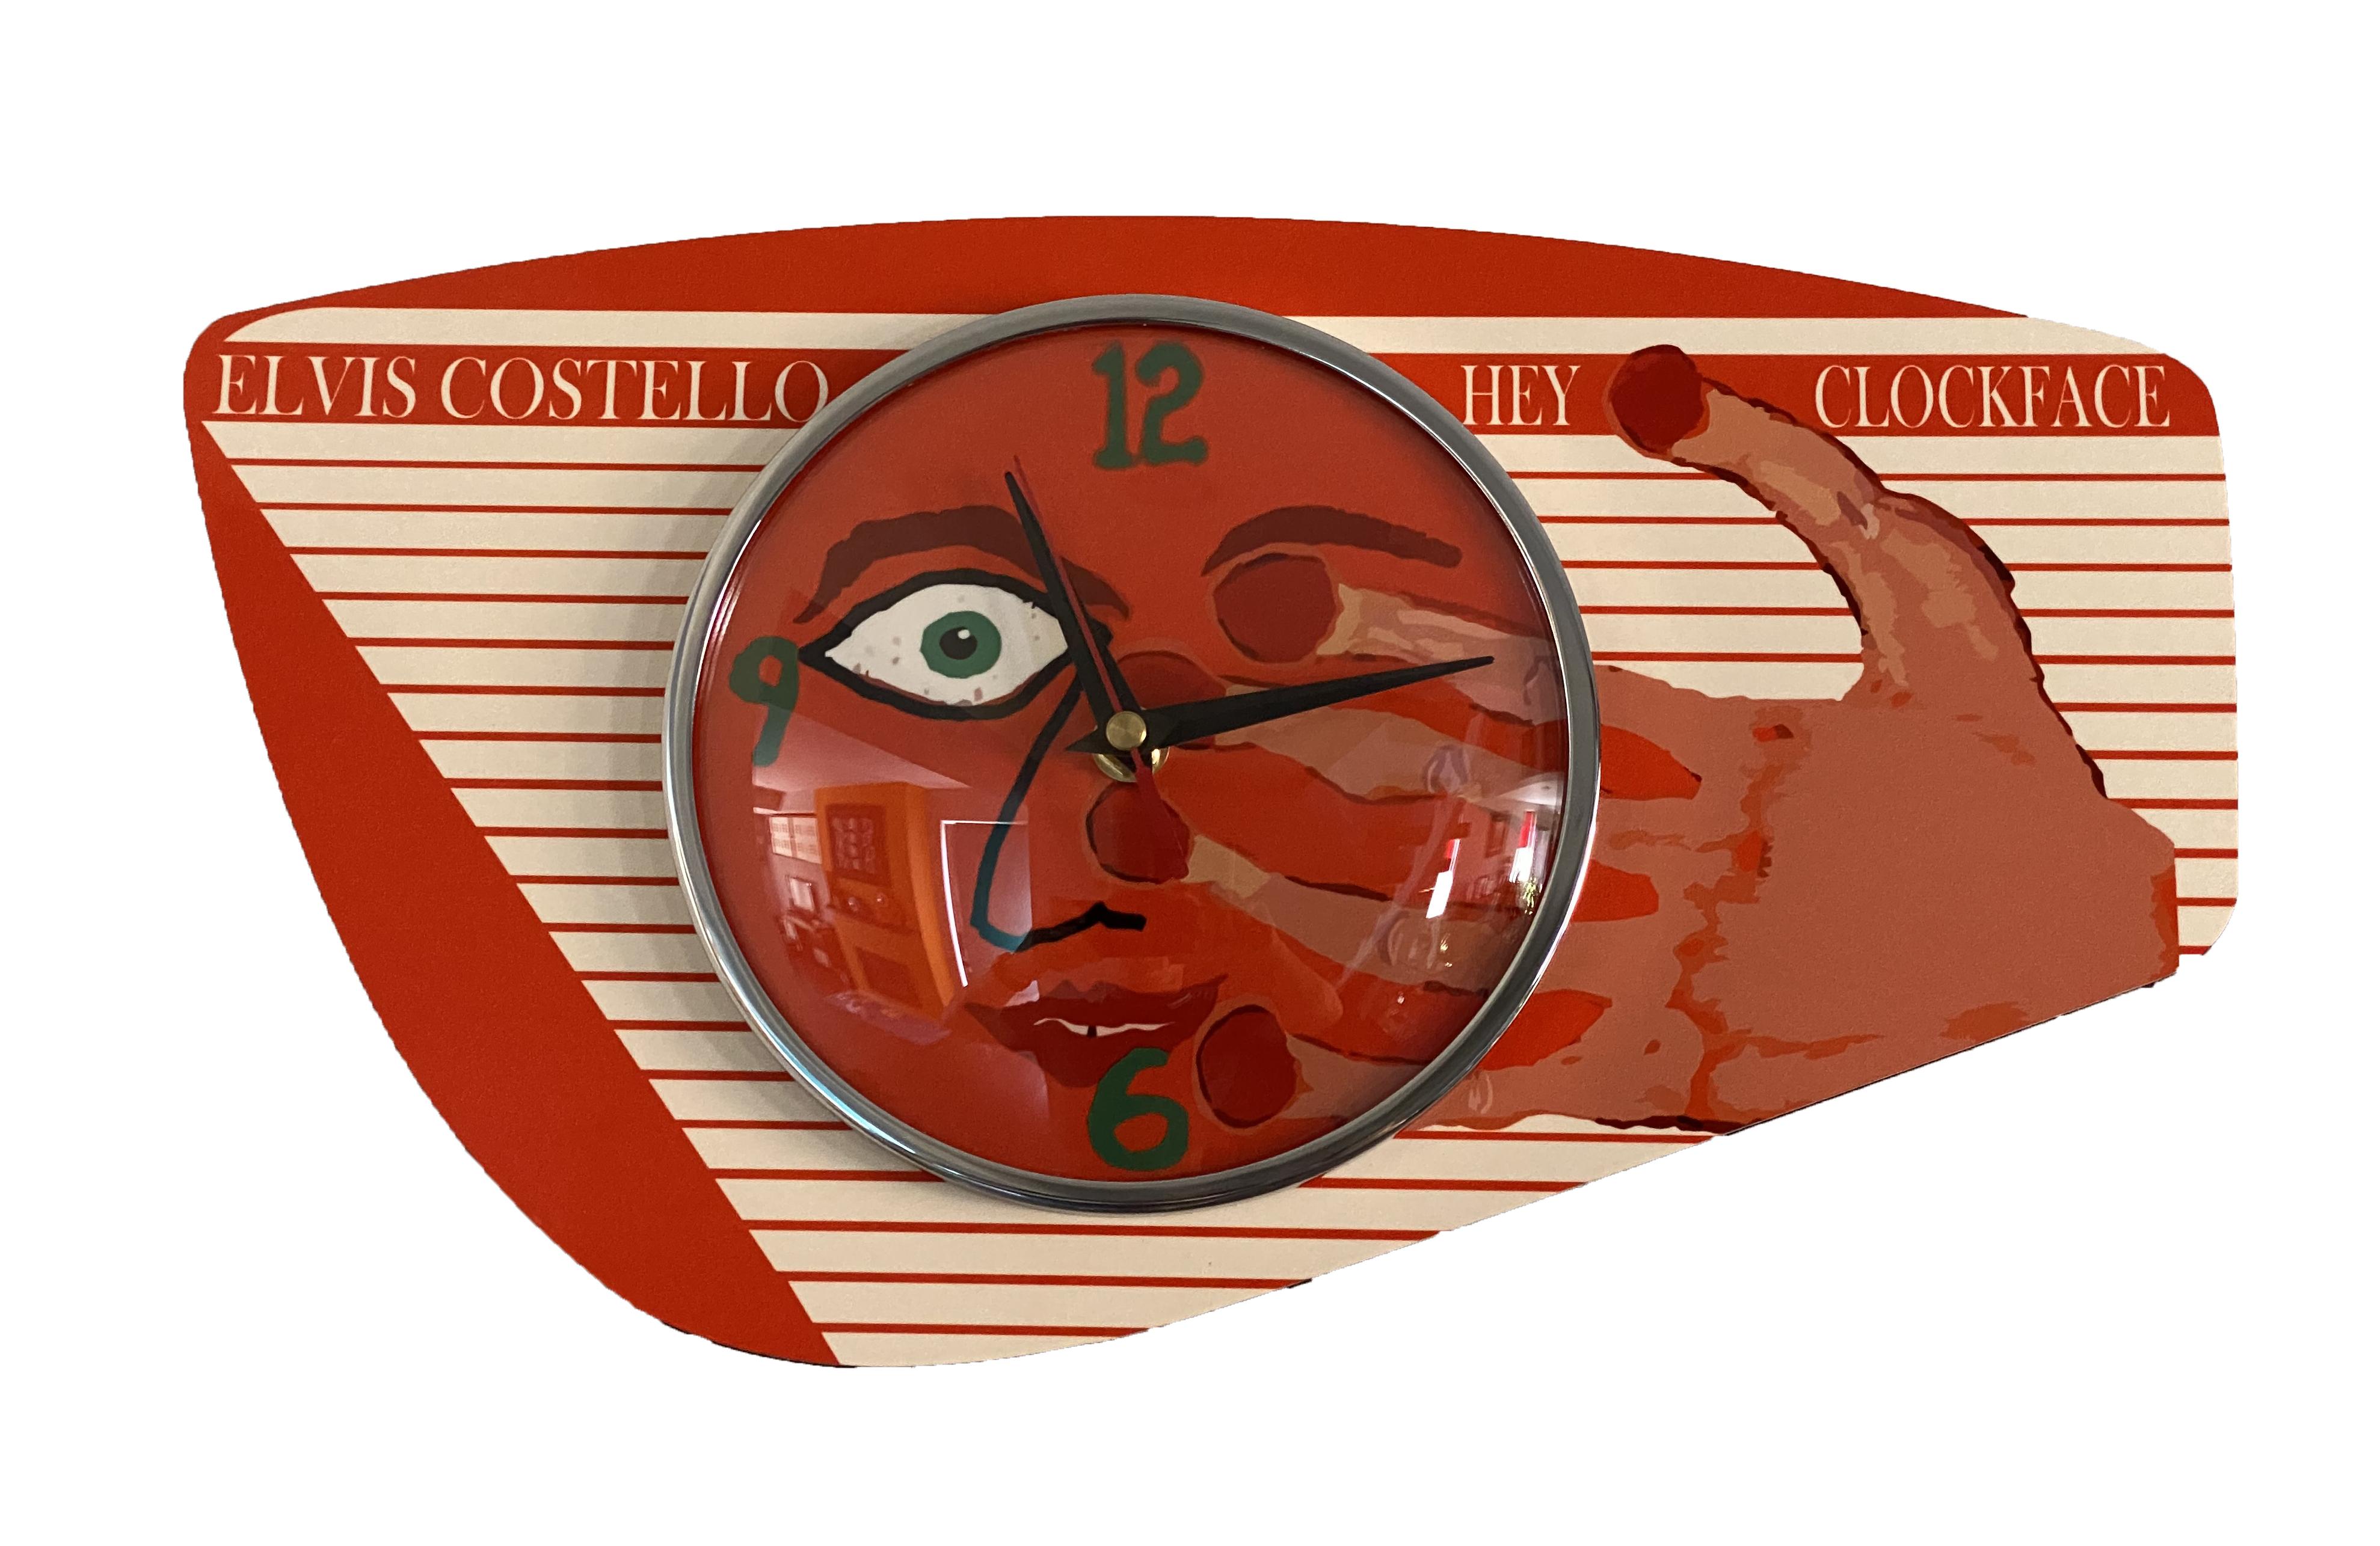 Handmade Hey Clockface Tangerine Orange Formica Wall Clock from Royale - 1950s French Atomic Retro style + Hey Clockface 2xLP/Vinyl/CD/Download (optional)